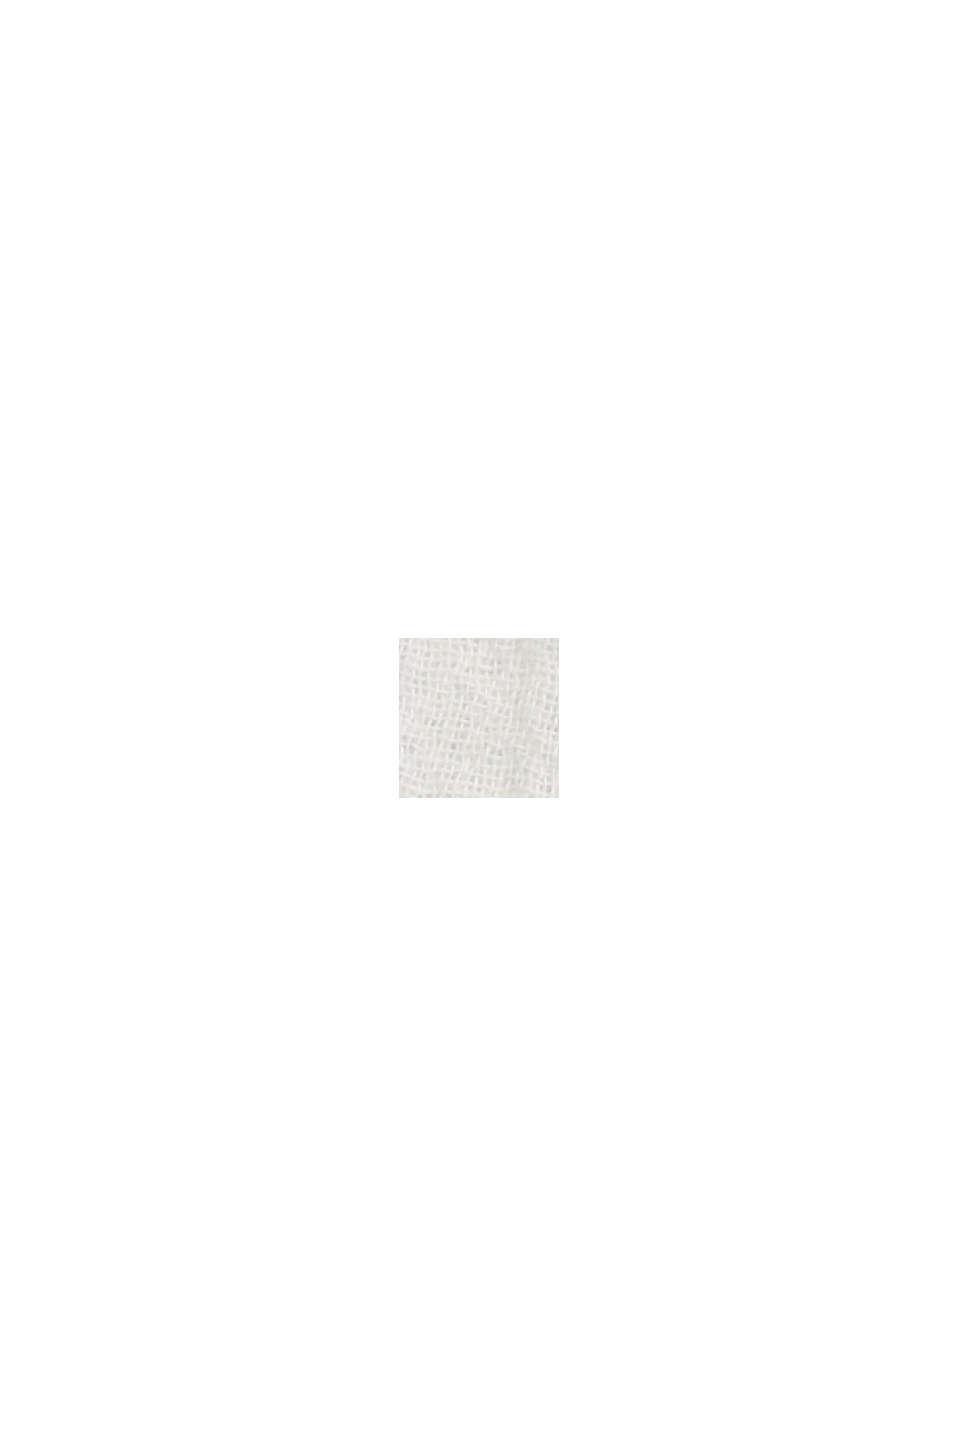 Boxy Materialmix-Shirt mit Bio-Baumwolle, OFF WHITE, swatch